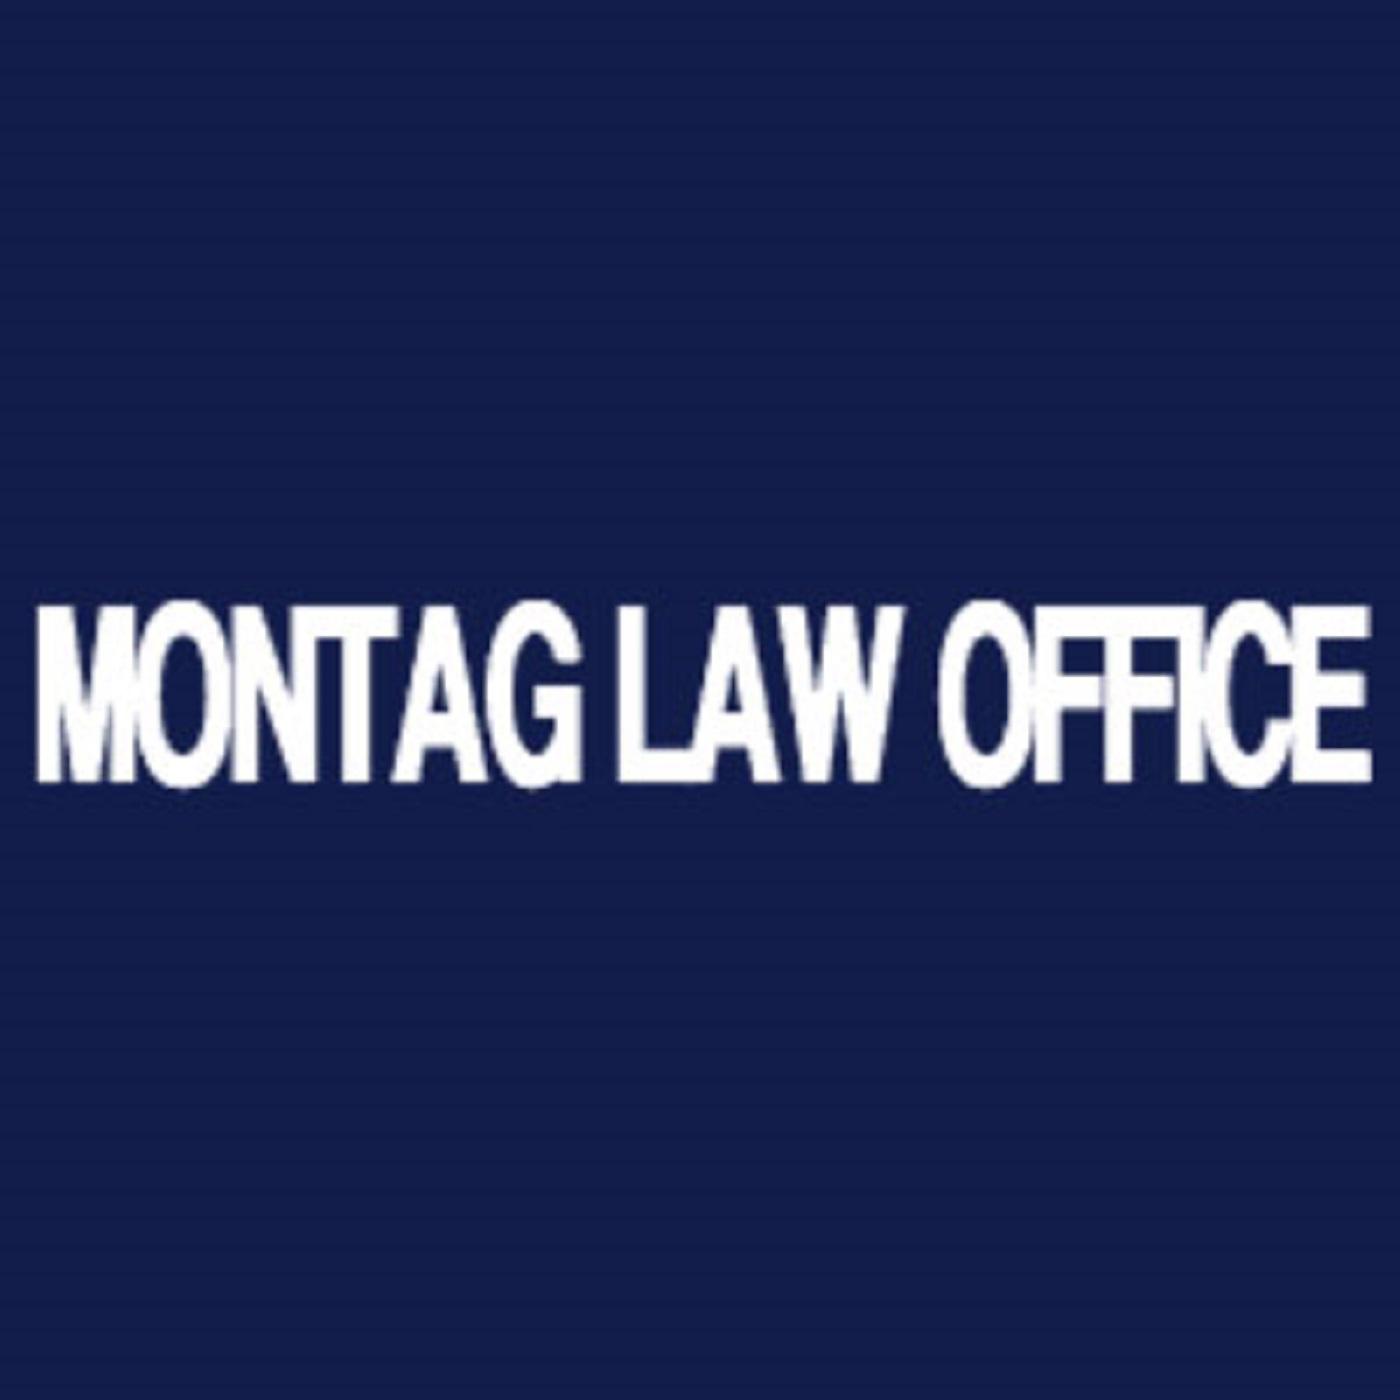 Auto injury attorney